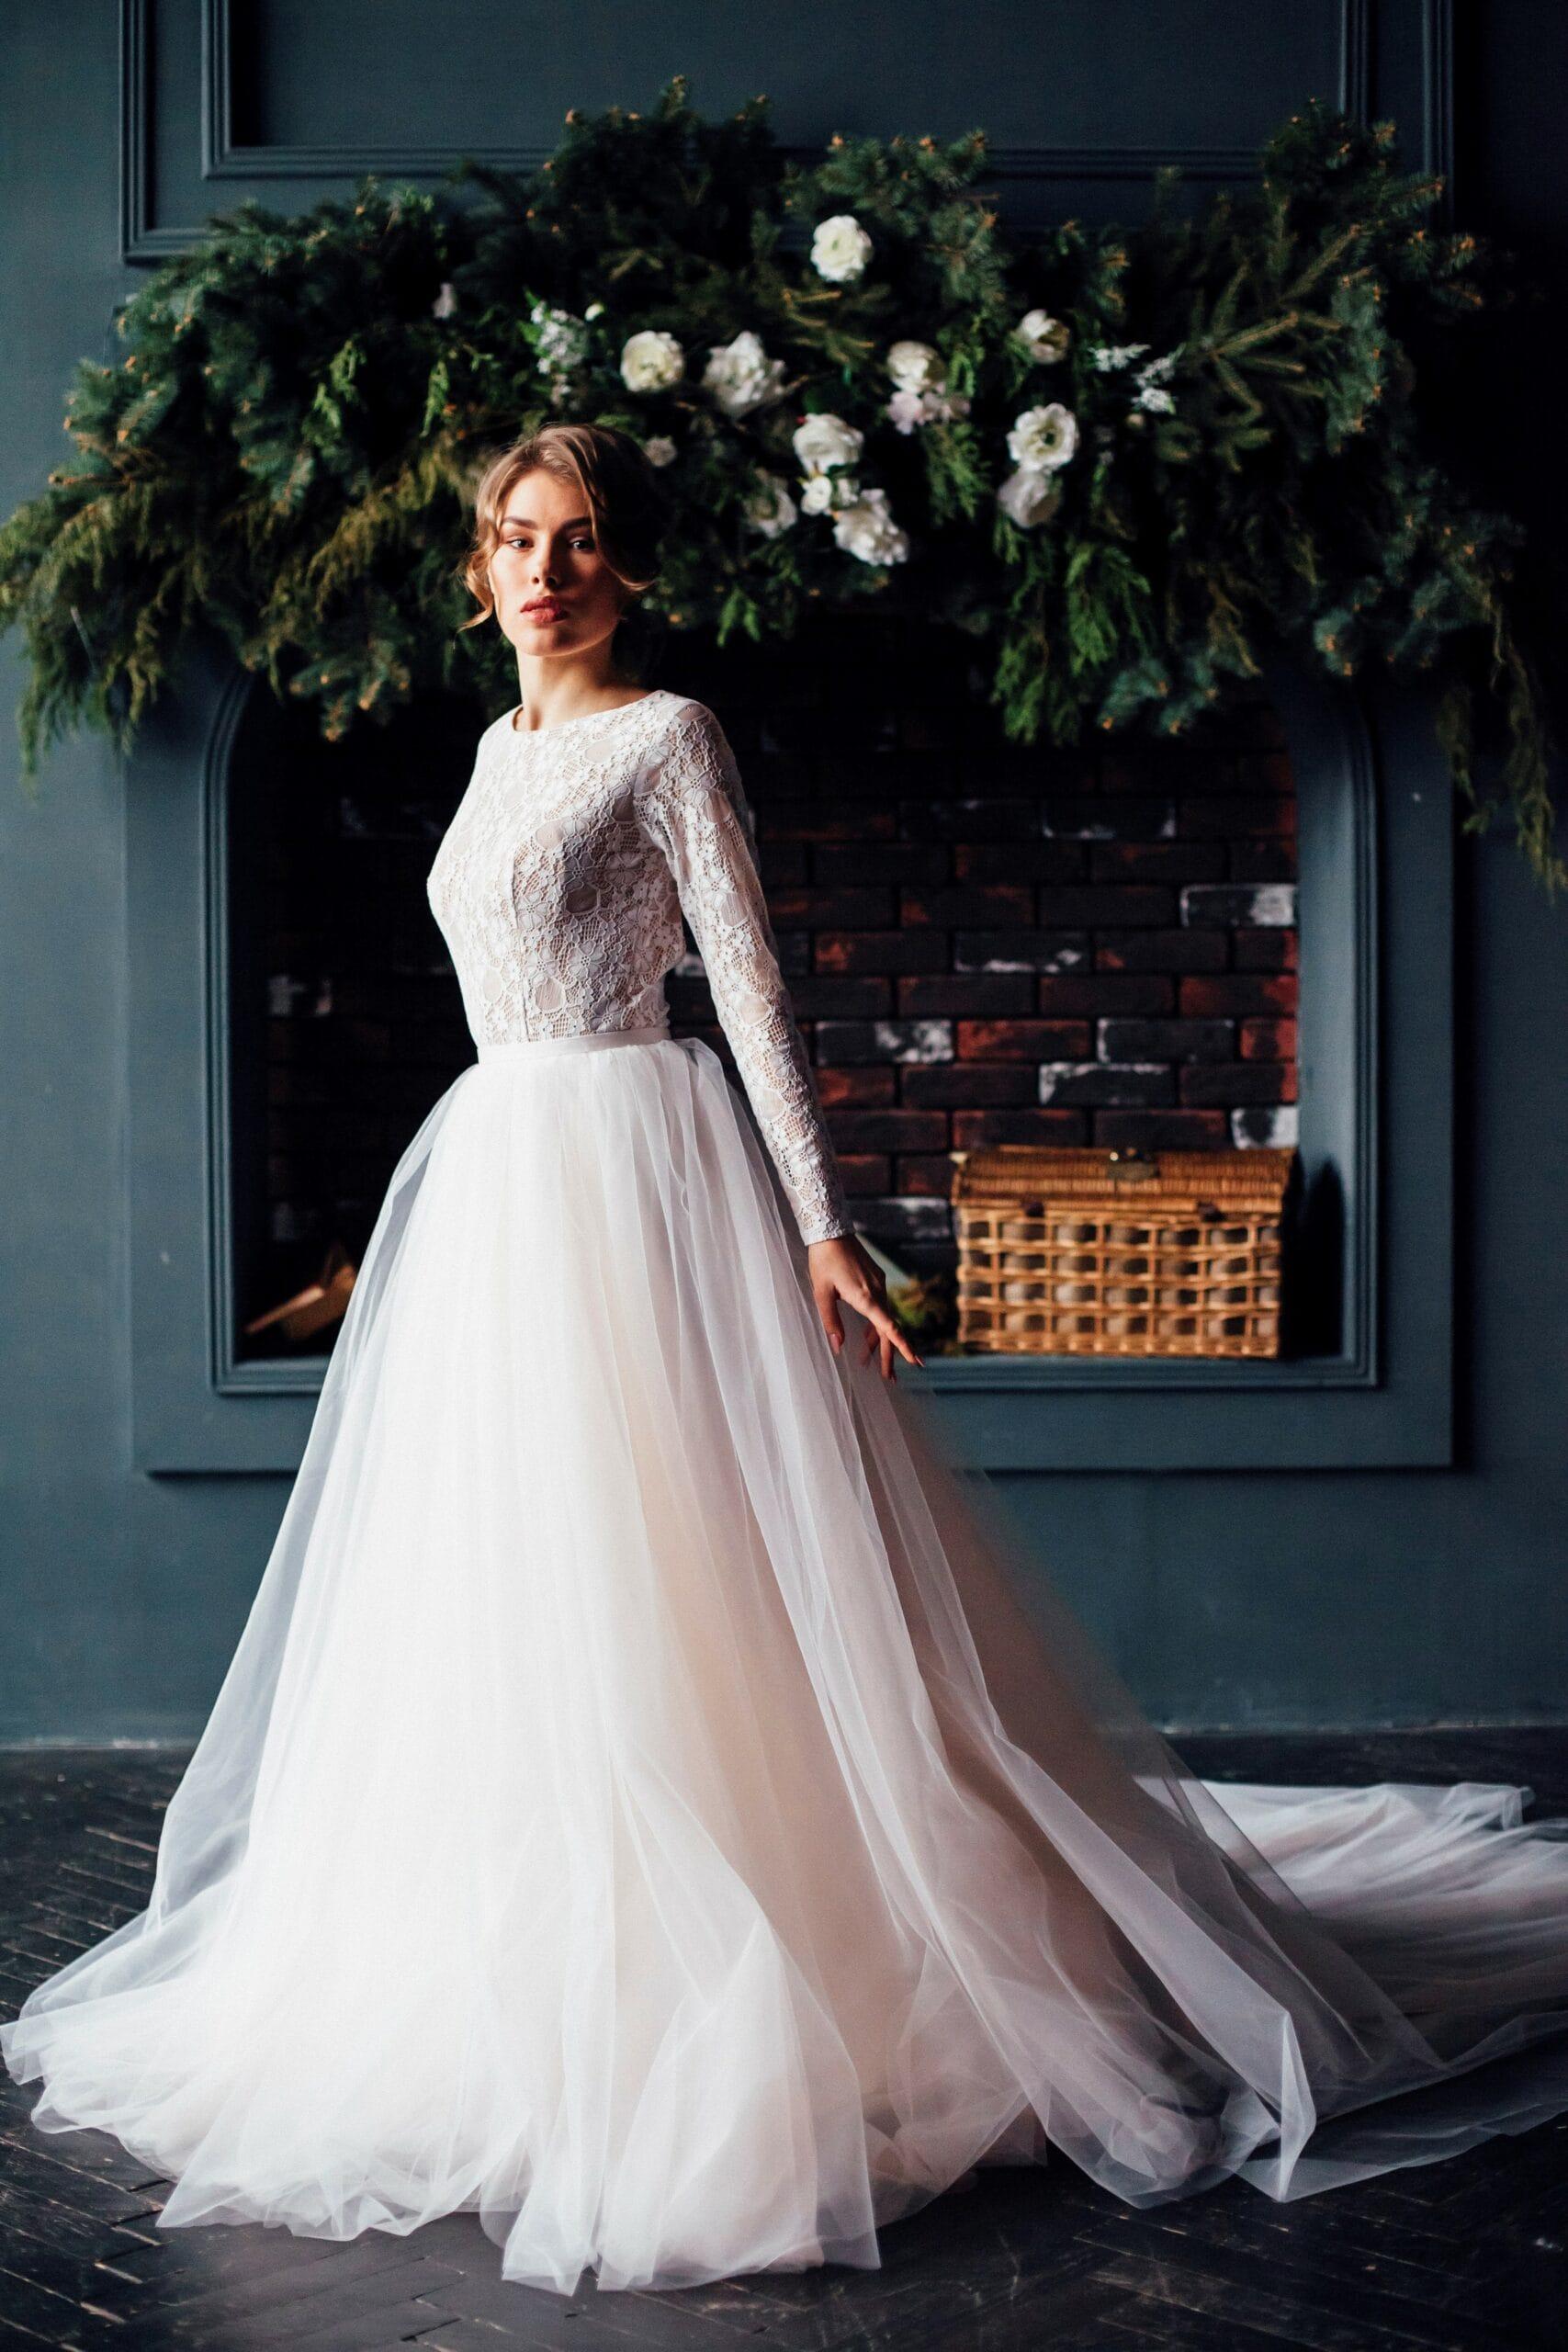 Свадебное платье PENELOPE, коллекция THE ABSOLUTE LOVE, бренд RARE BRIDAL, фото 2